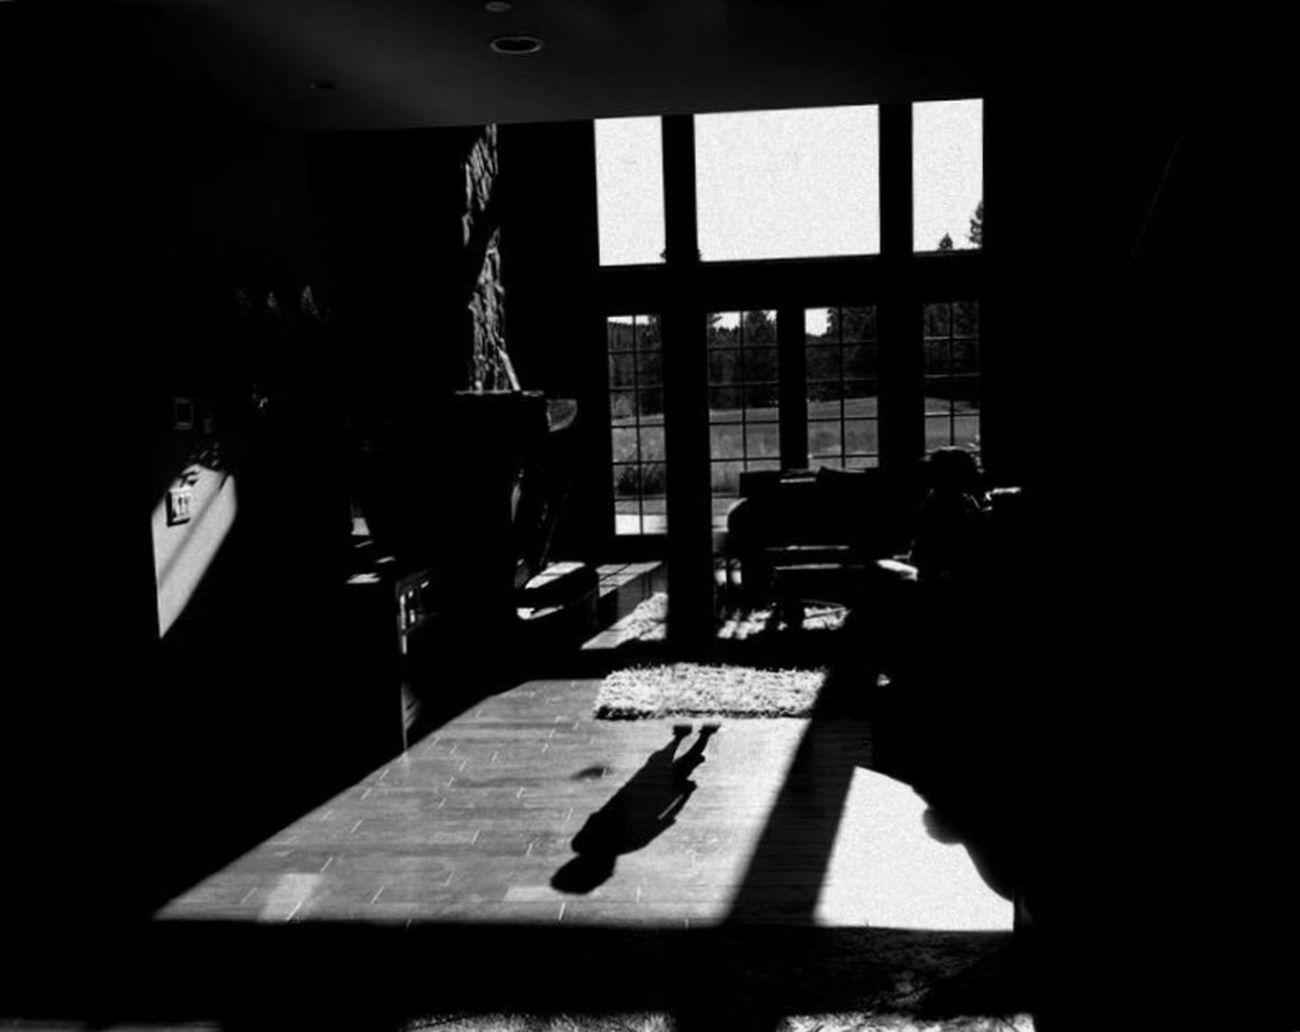 B&w Street Photography Light And Shadow